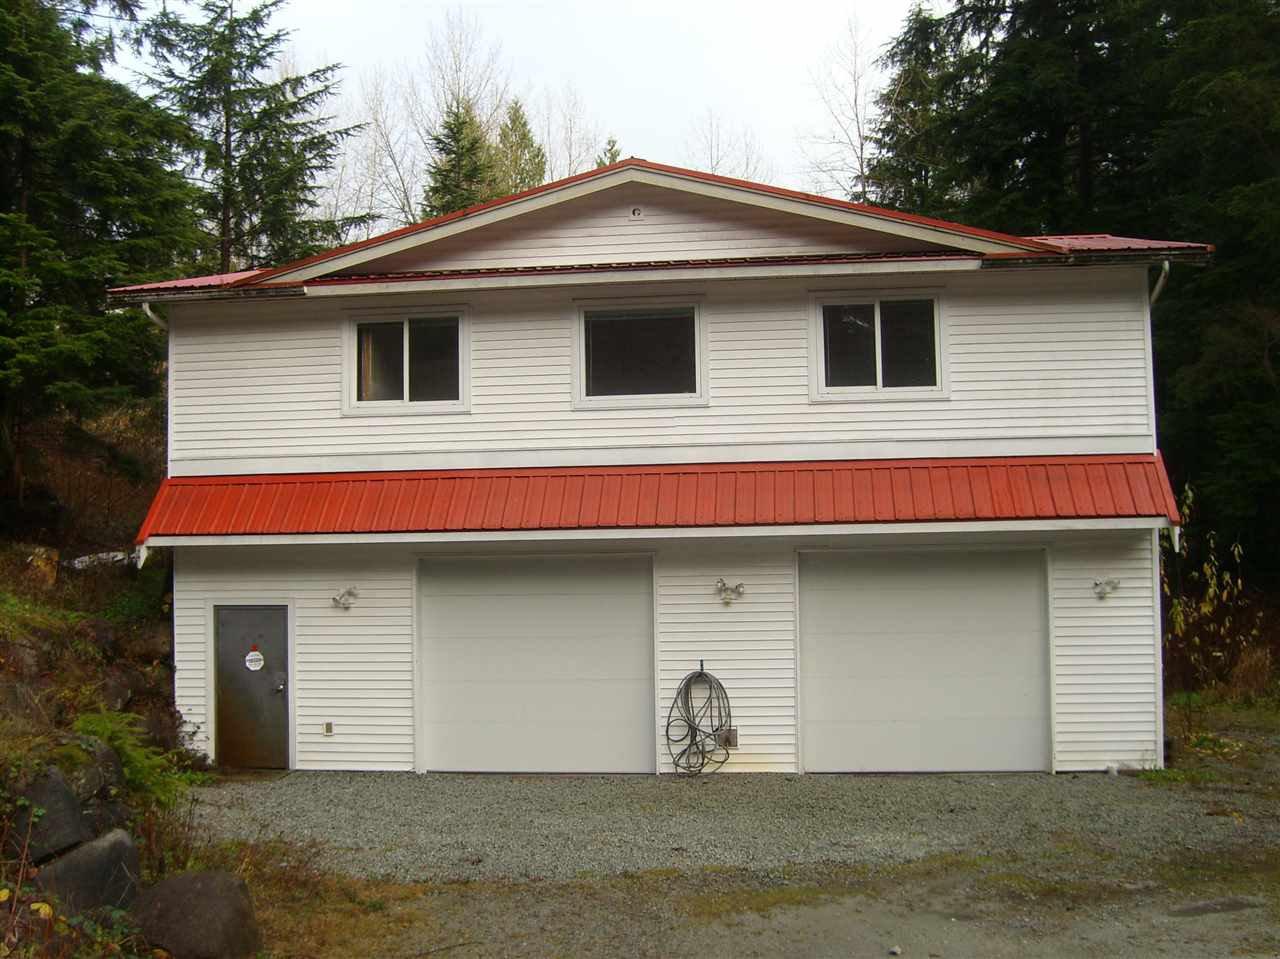 Photo 17: Photos: 28640 123 Avenue in Maple Ridge: Northeast House for sale : MLS®# R2419989